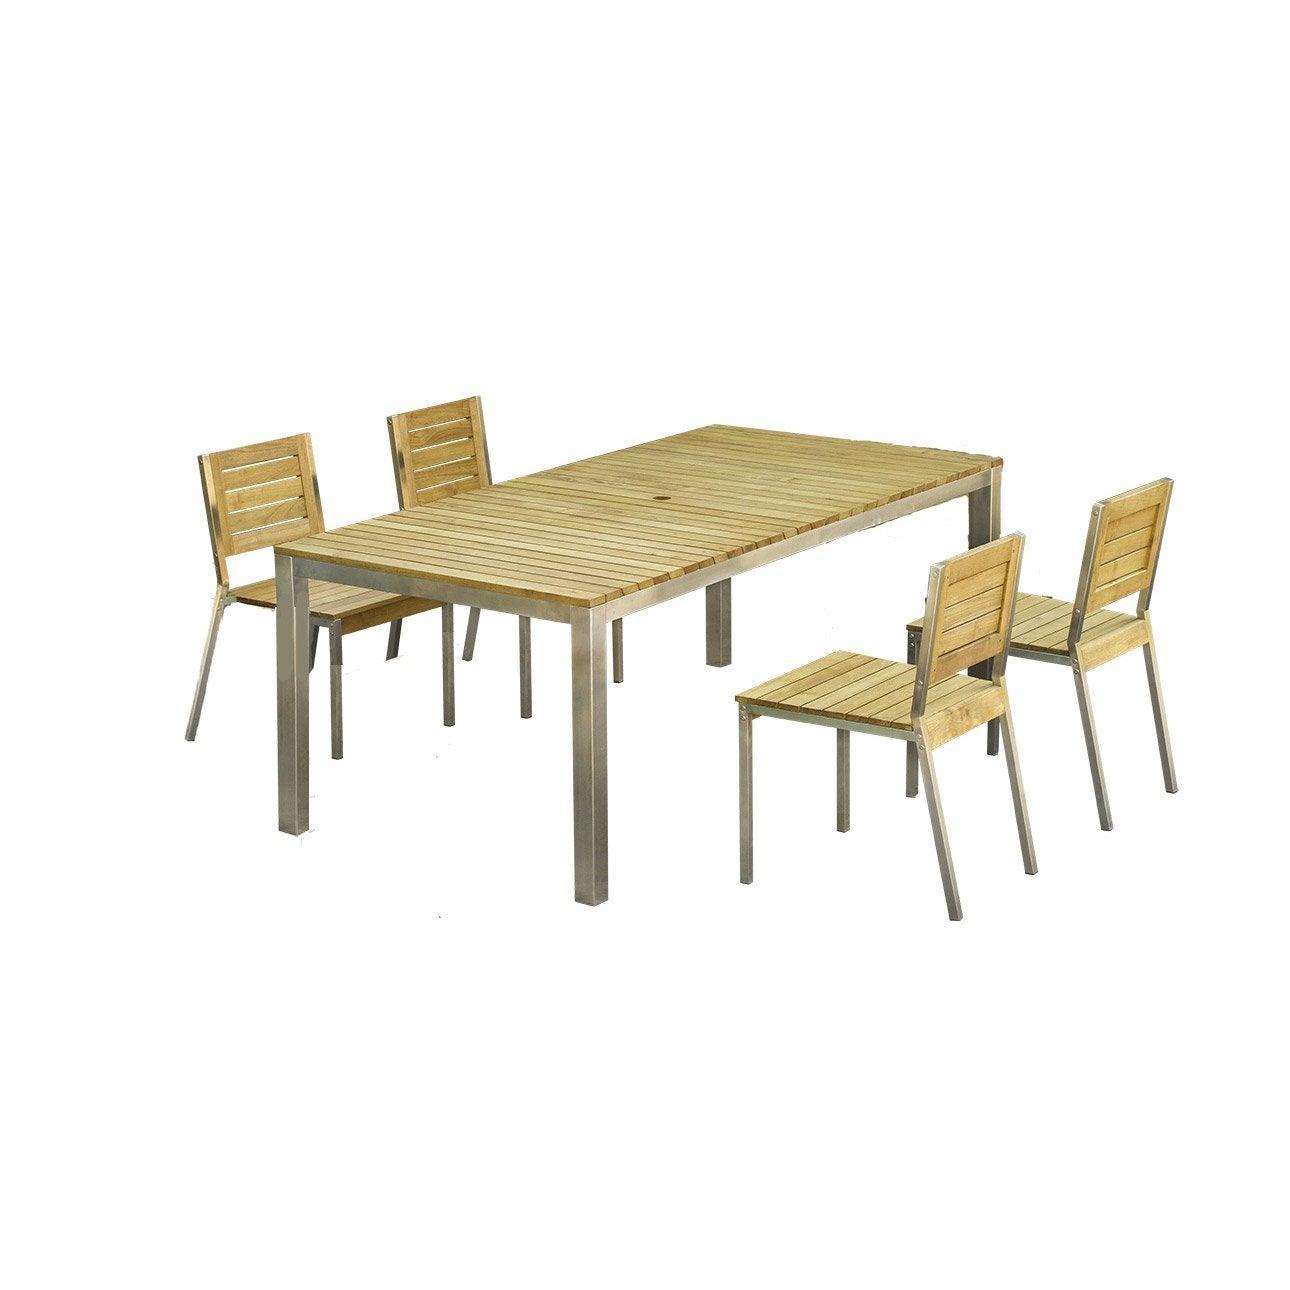 Salon de jardin Robinox bois naturel, 6 personnes | Leroy Merlin